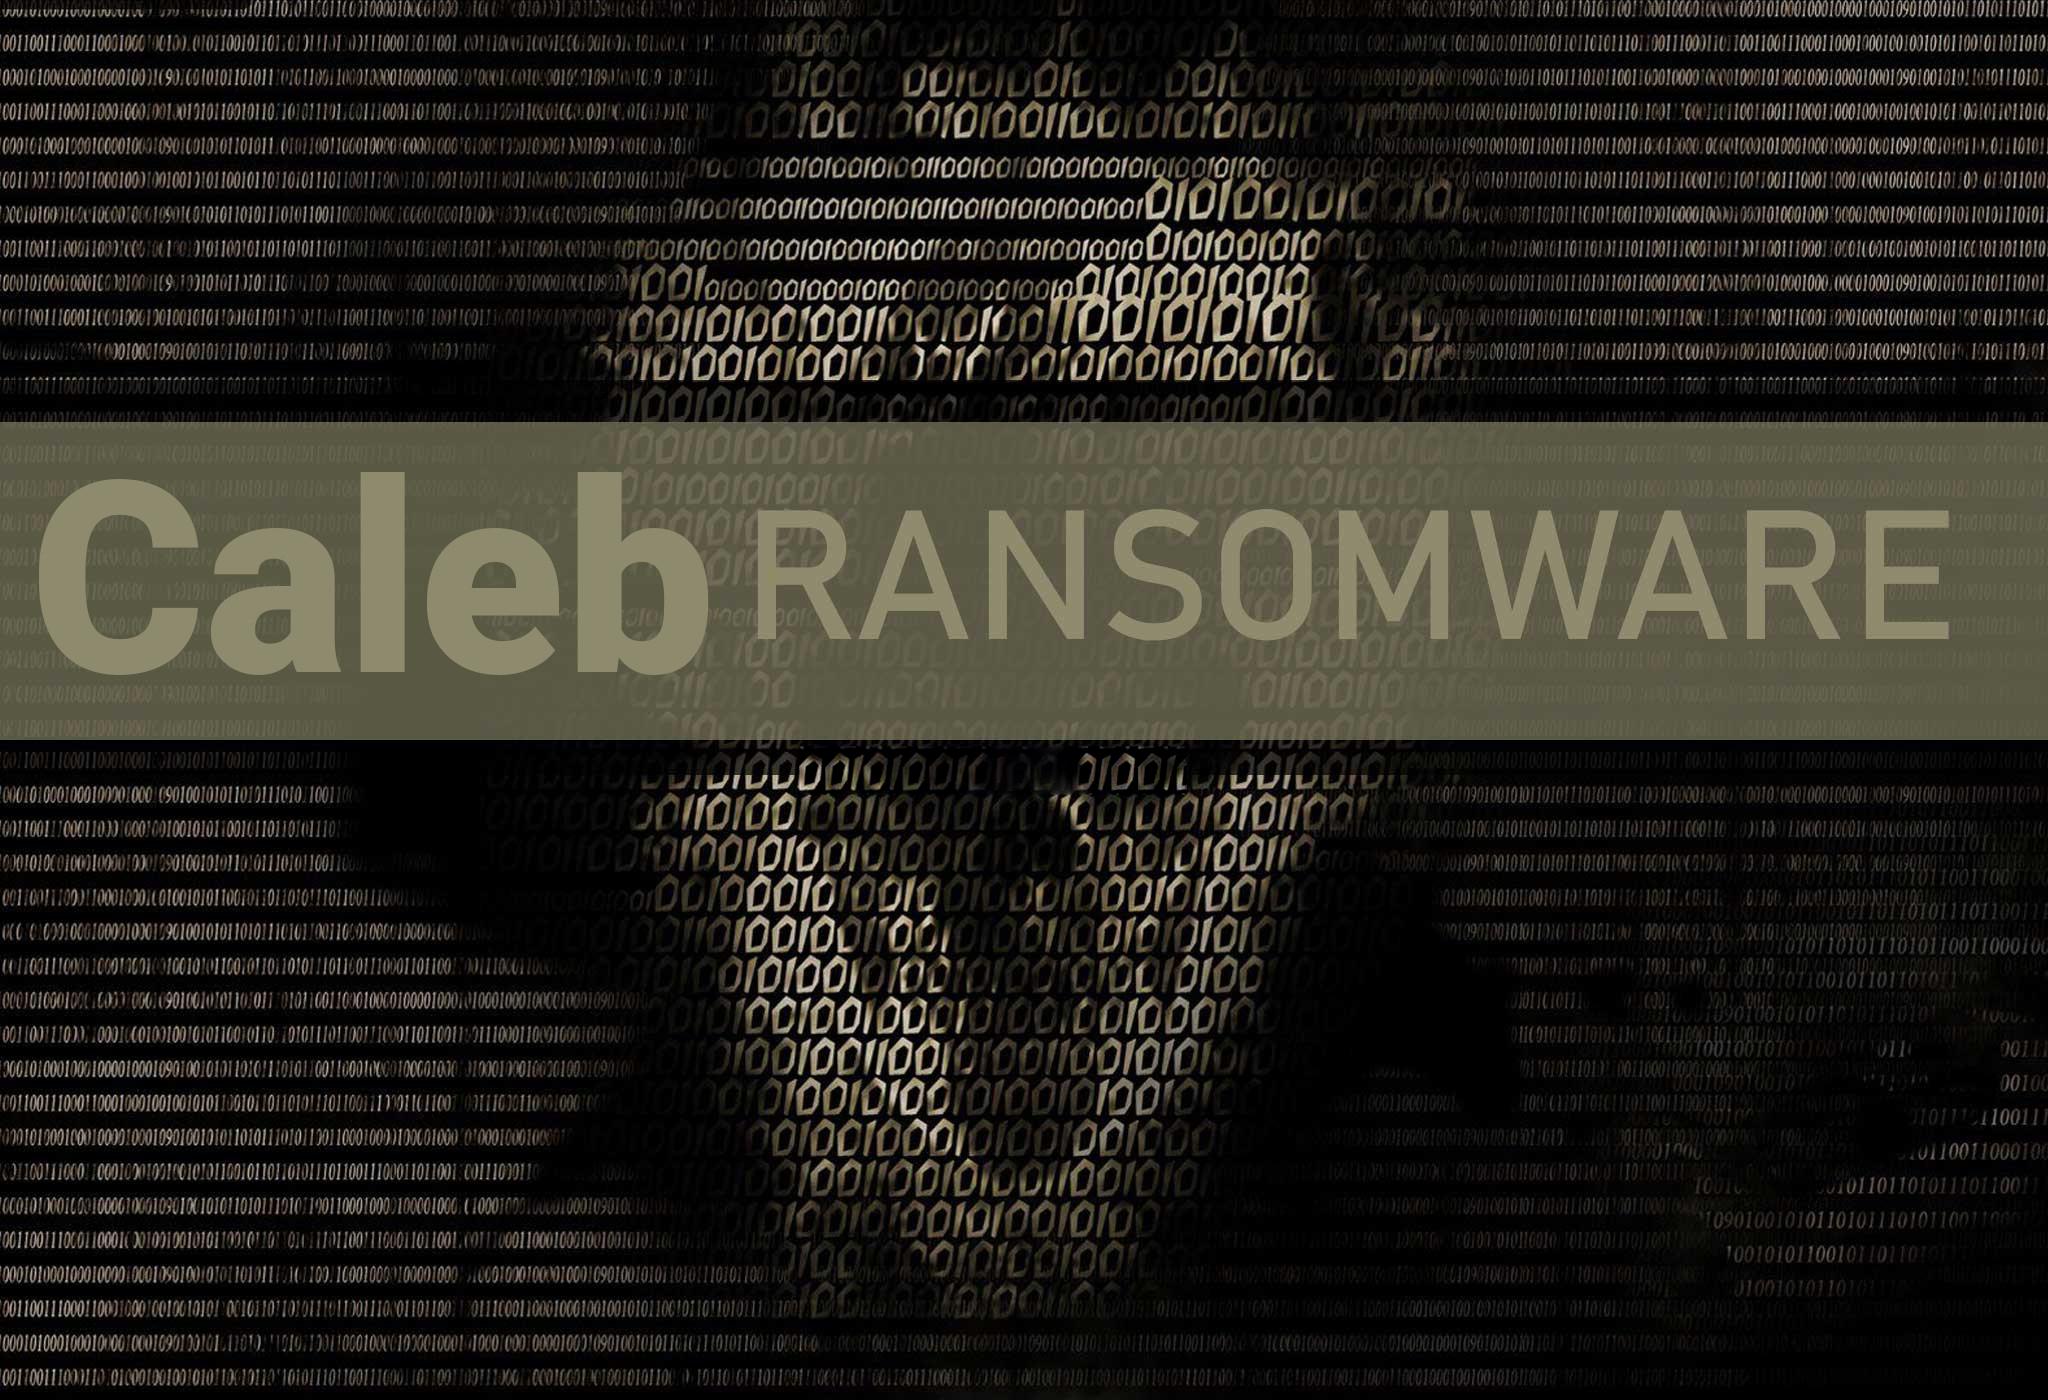 Caleb Ransomware